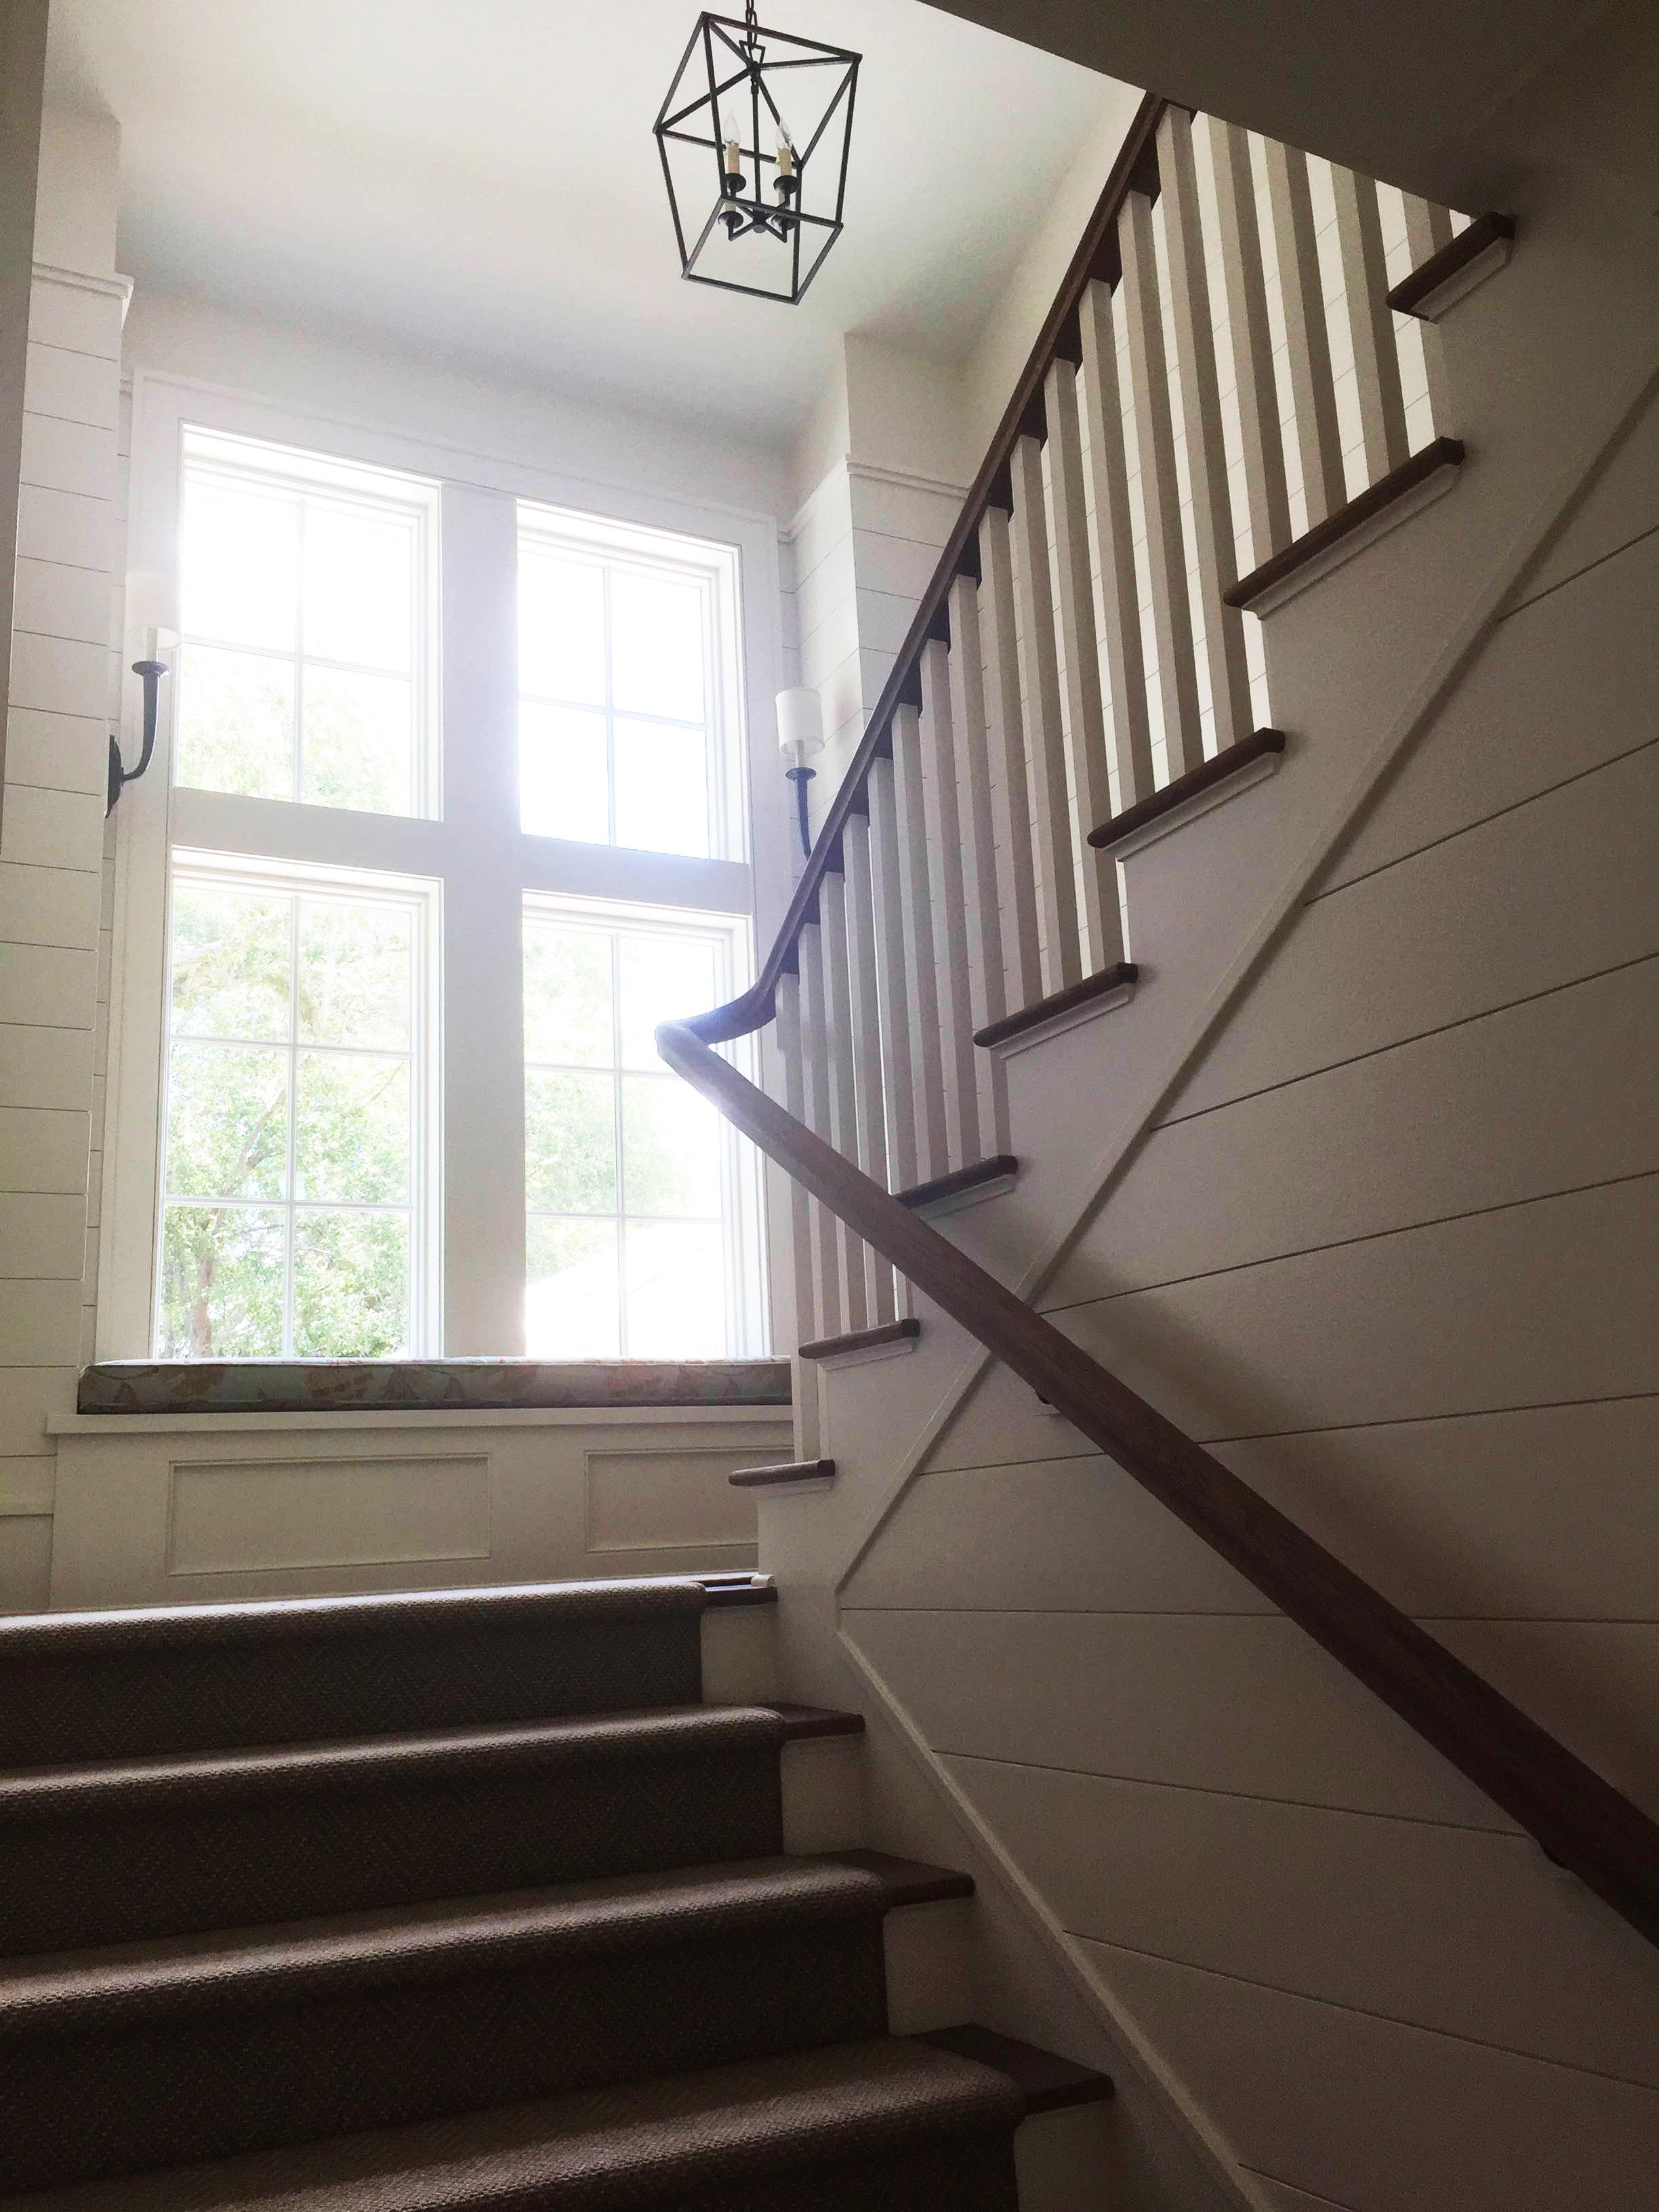 08. Stairwell.jpg